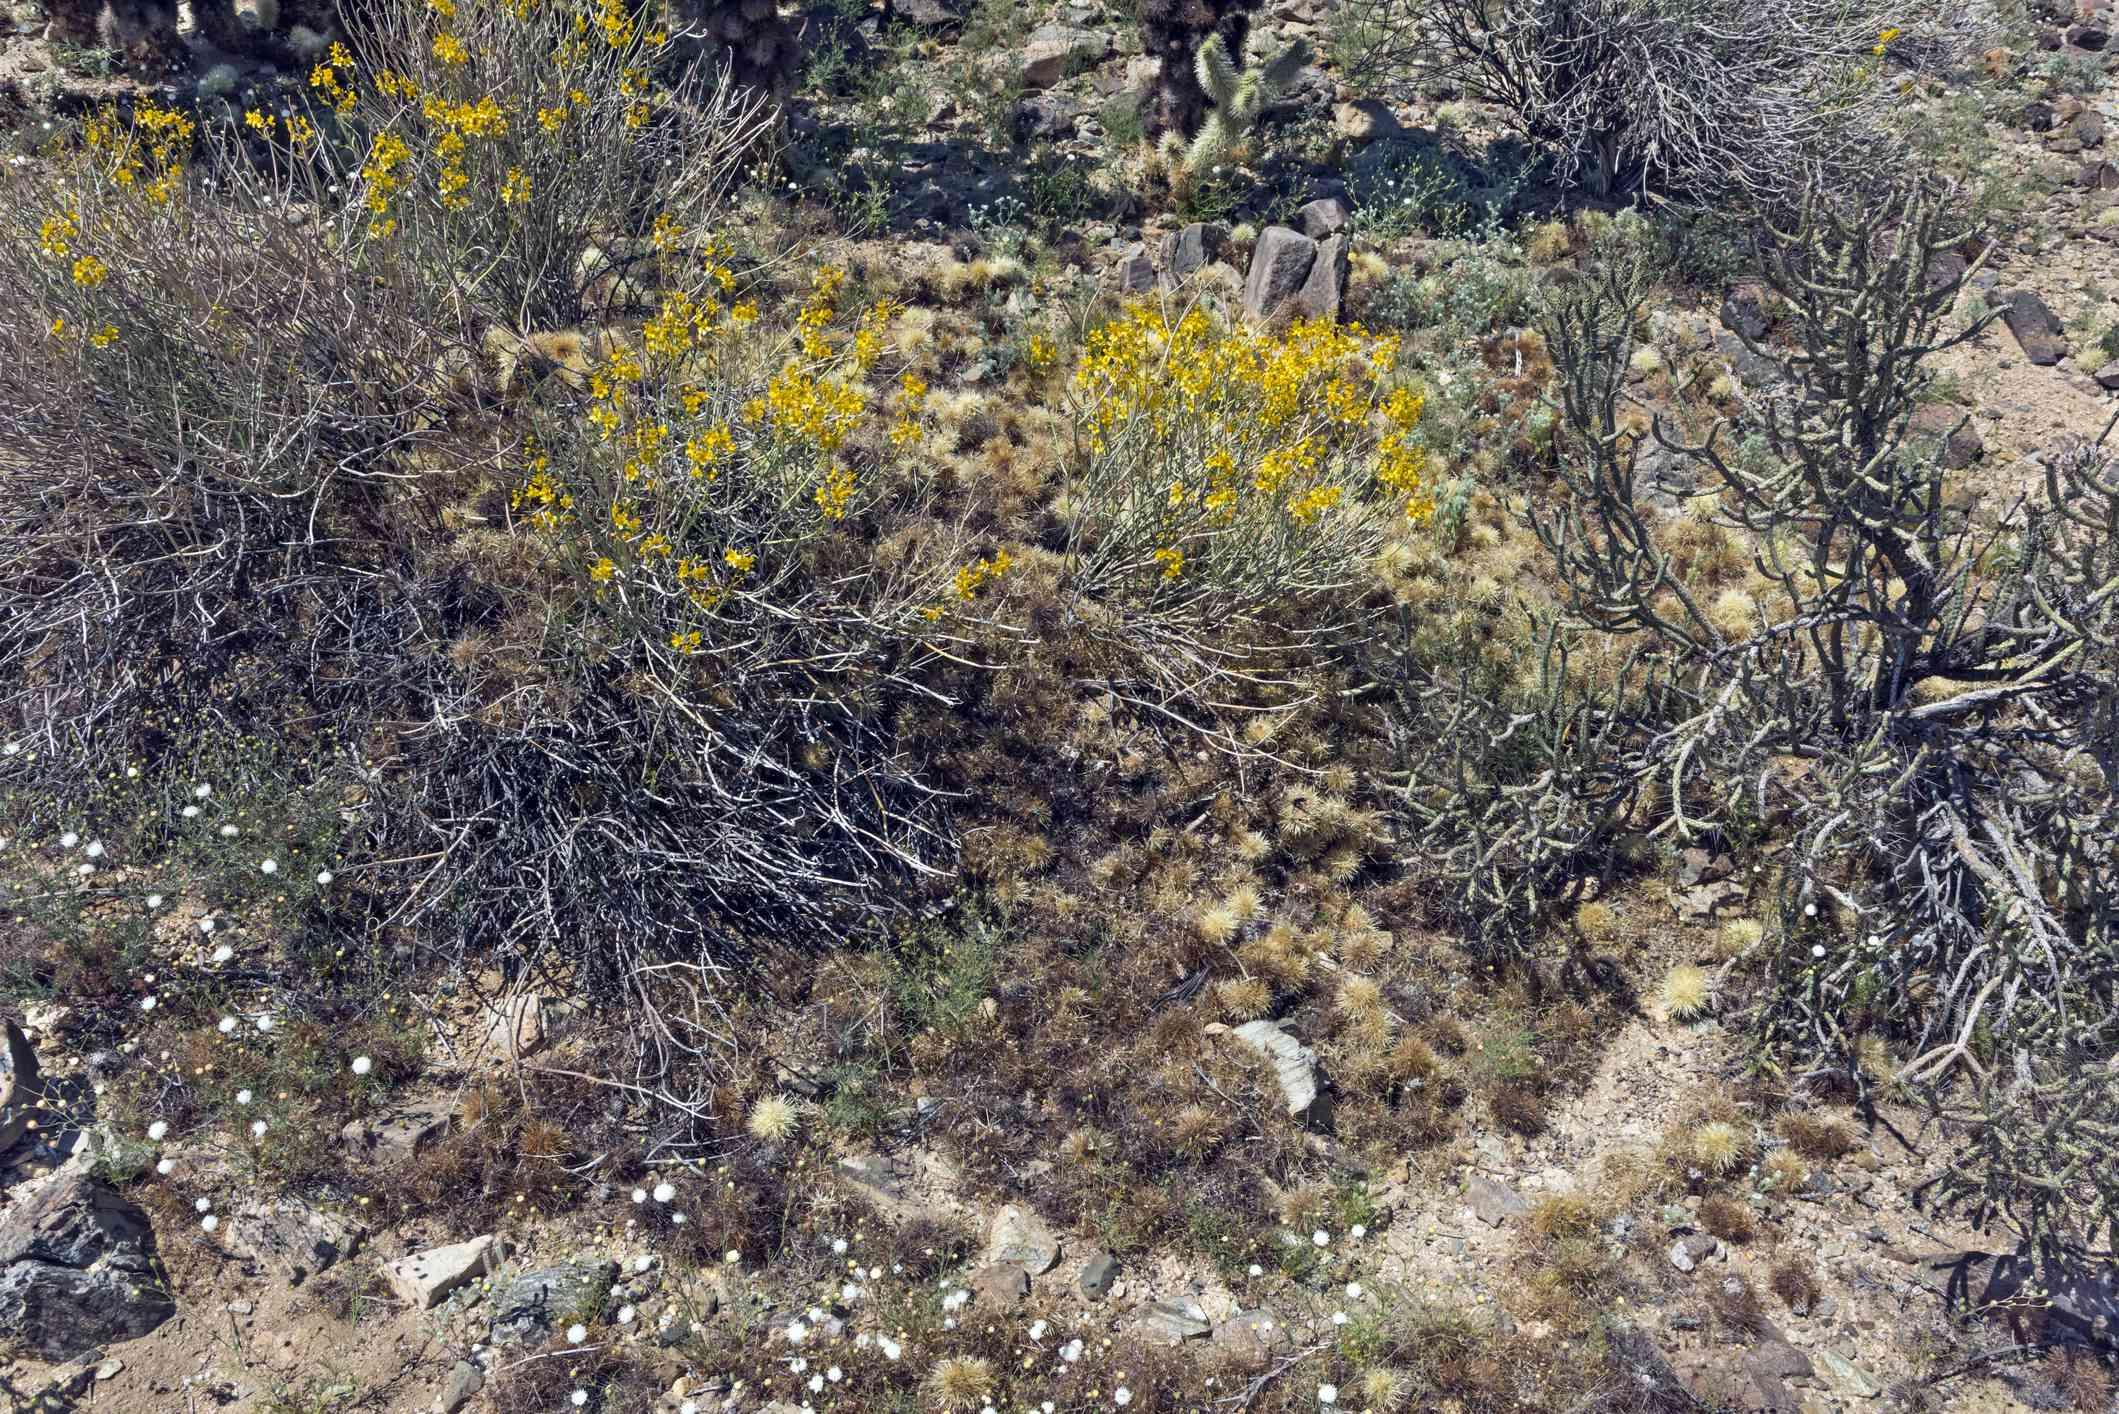 Packrat midden constructed of cholla cactus segments